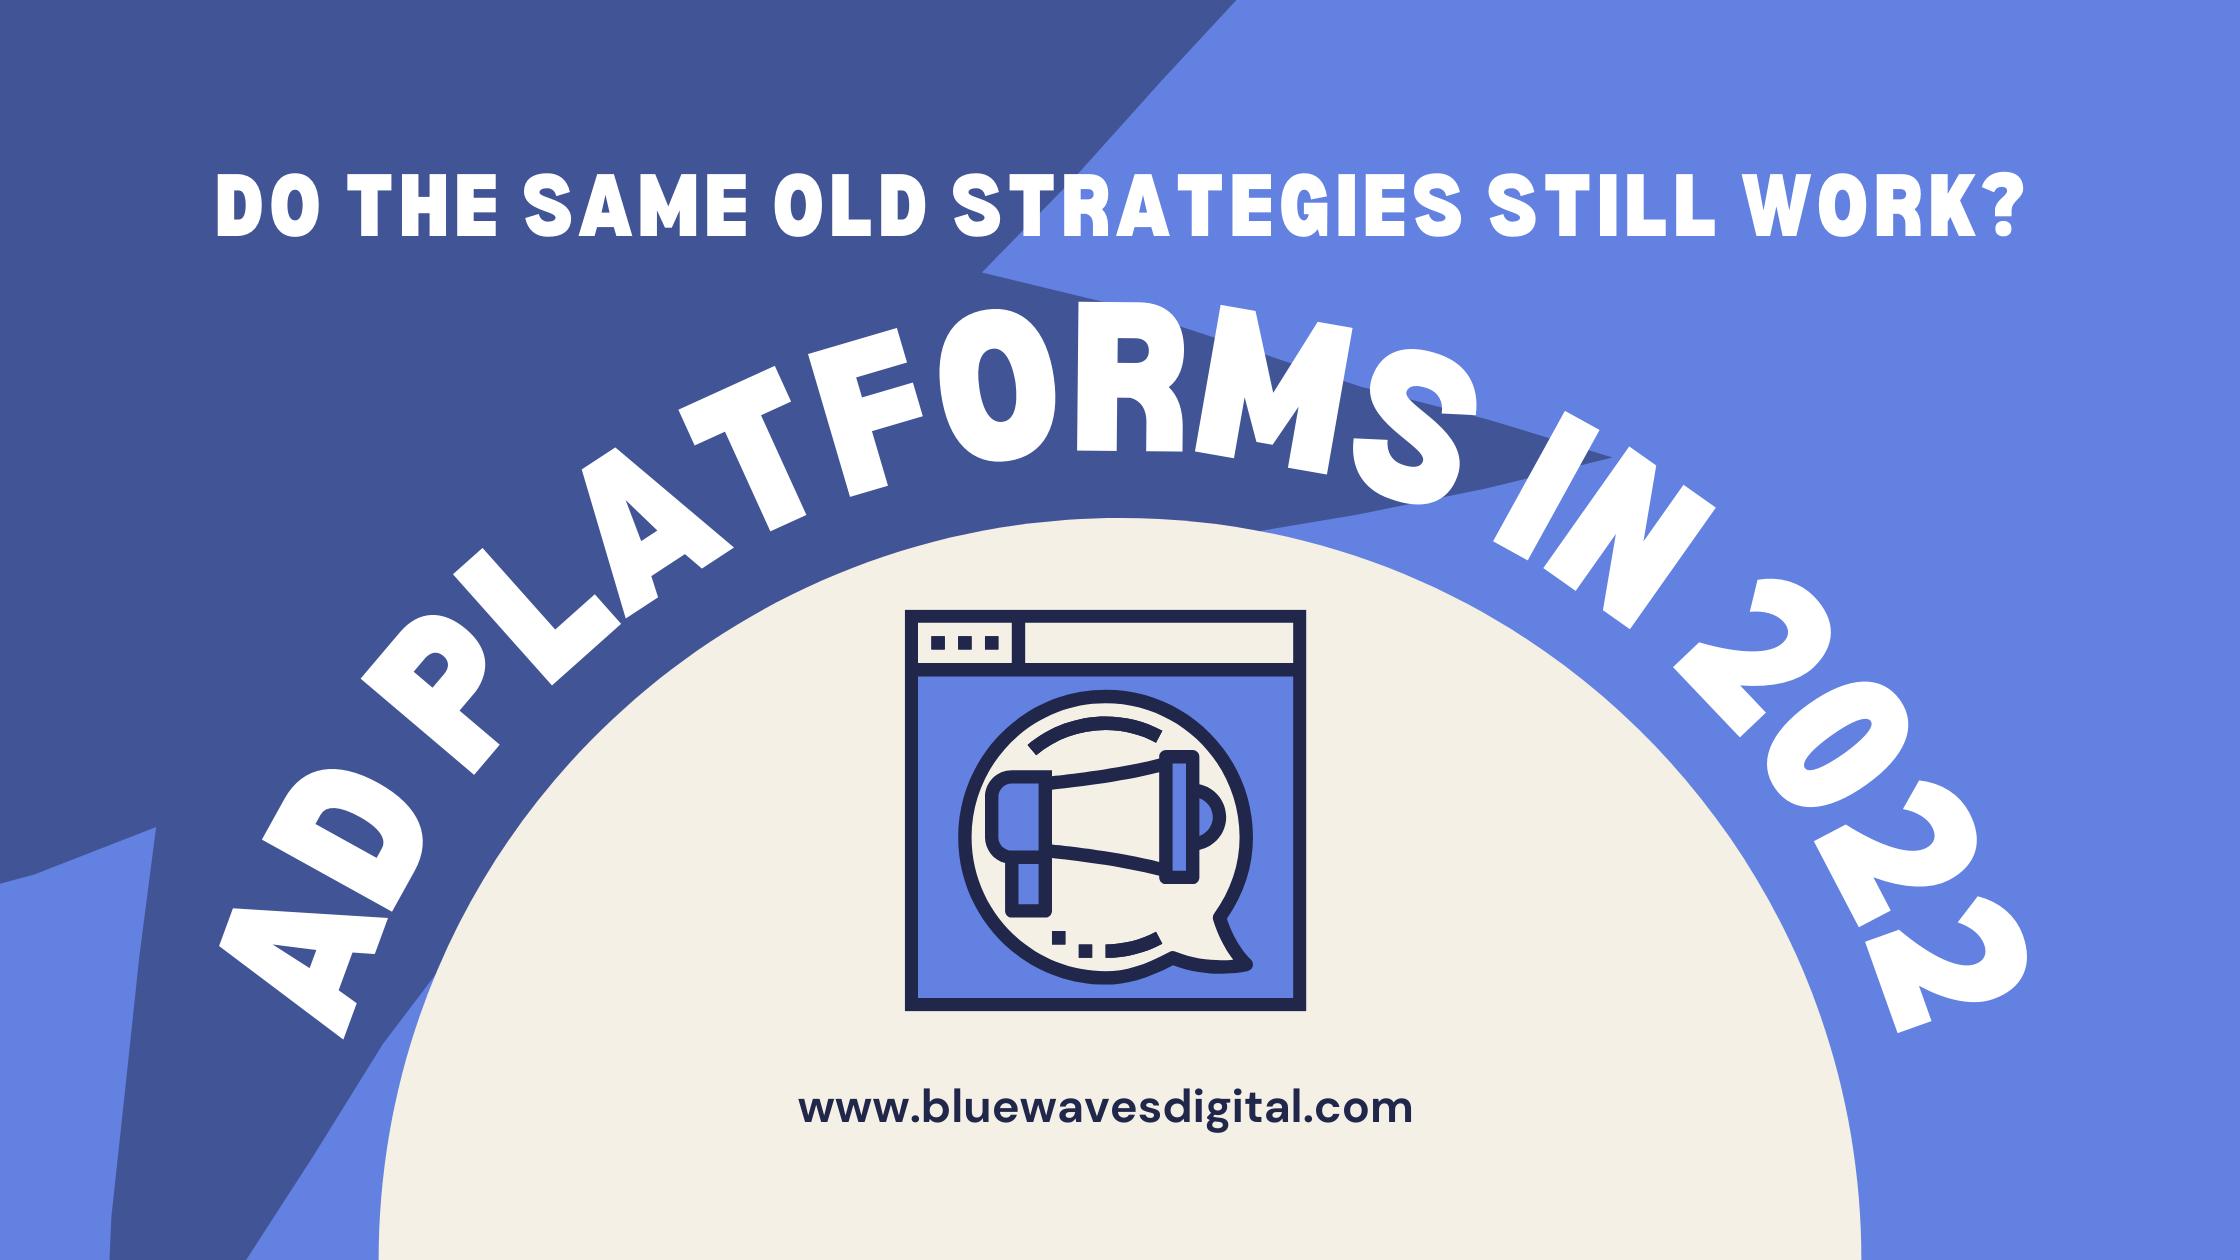 Ad Platforms in 2022 - Do the Same Old Strategies Still Work